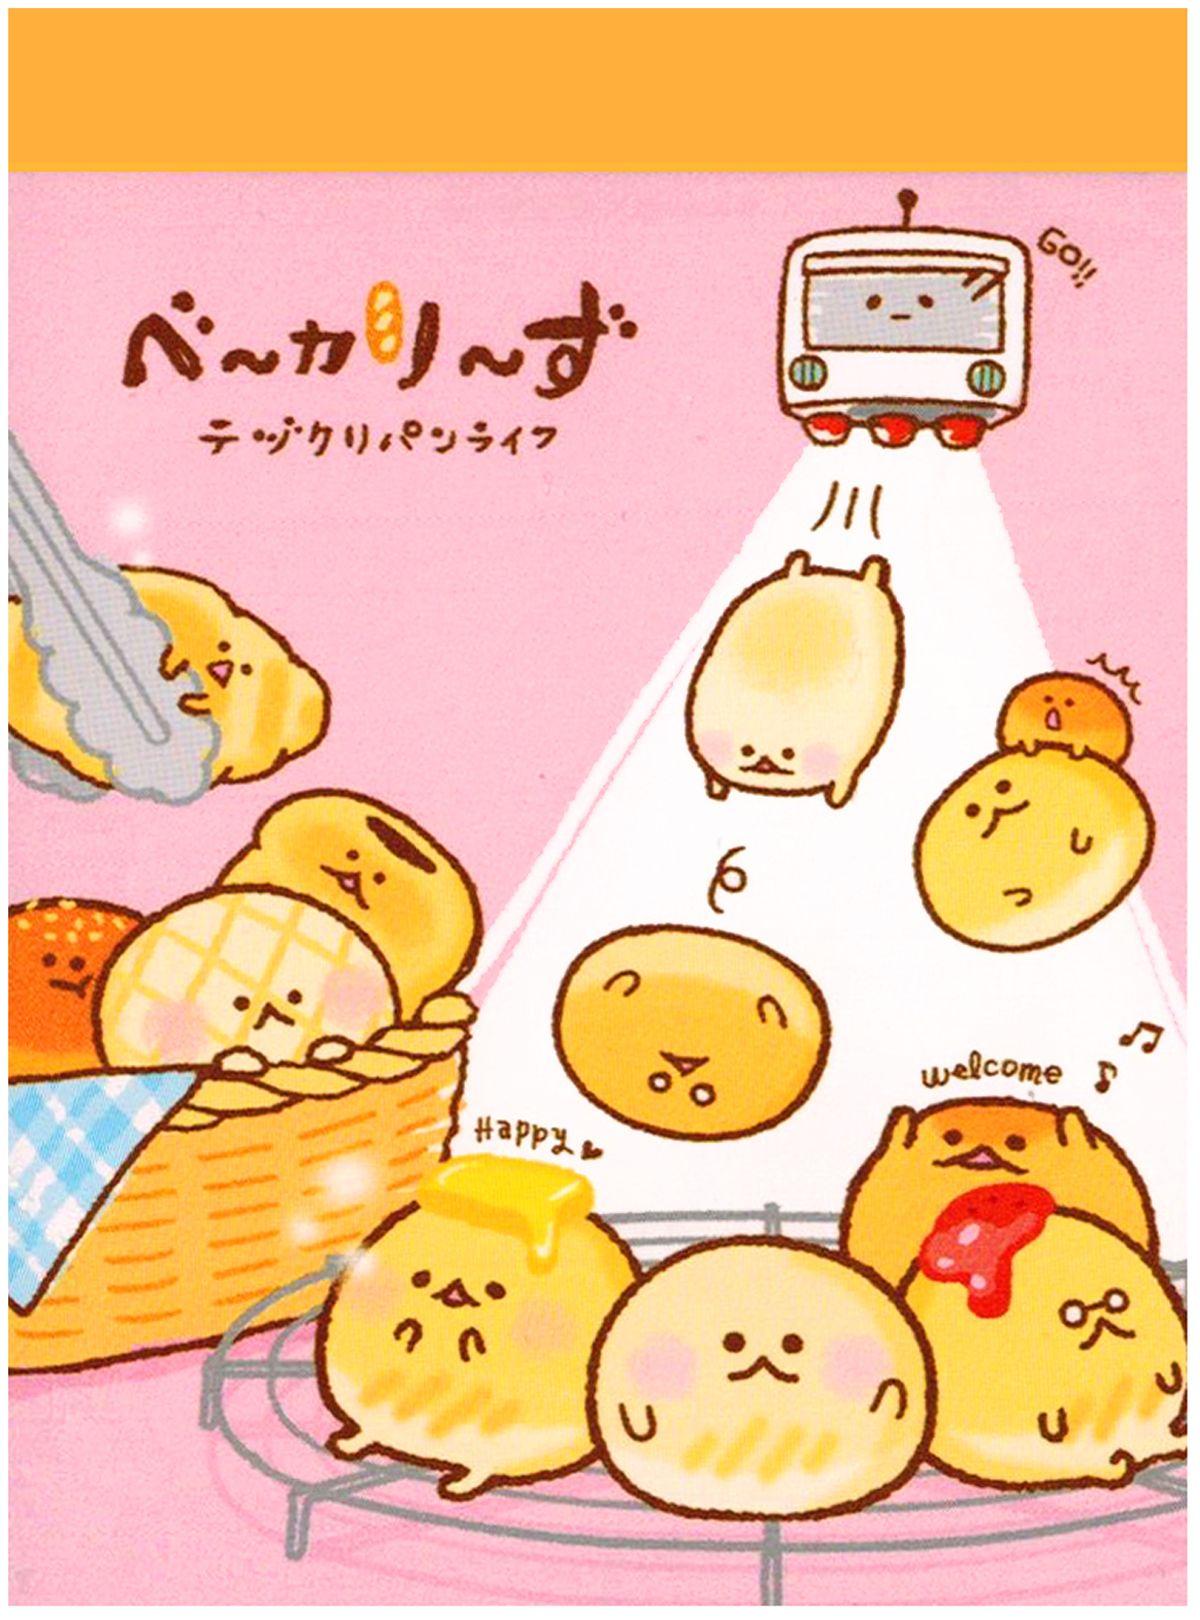 crux cute bread buns mini memo pad | かわいい_イラスト | pinterest